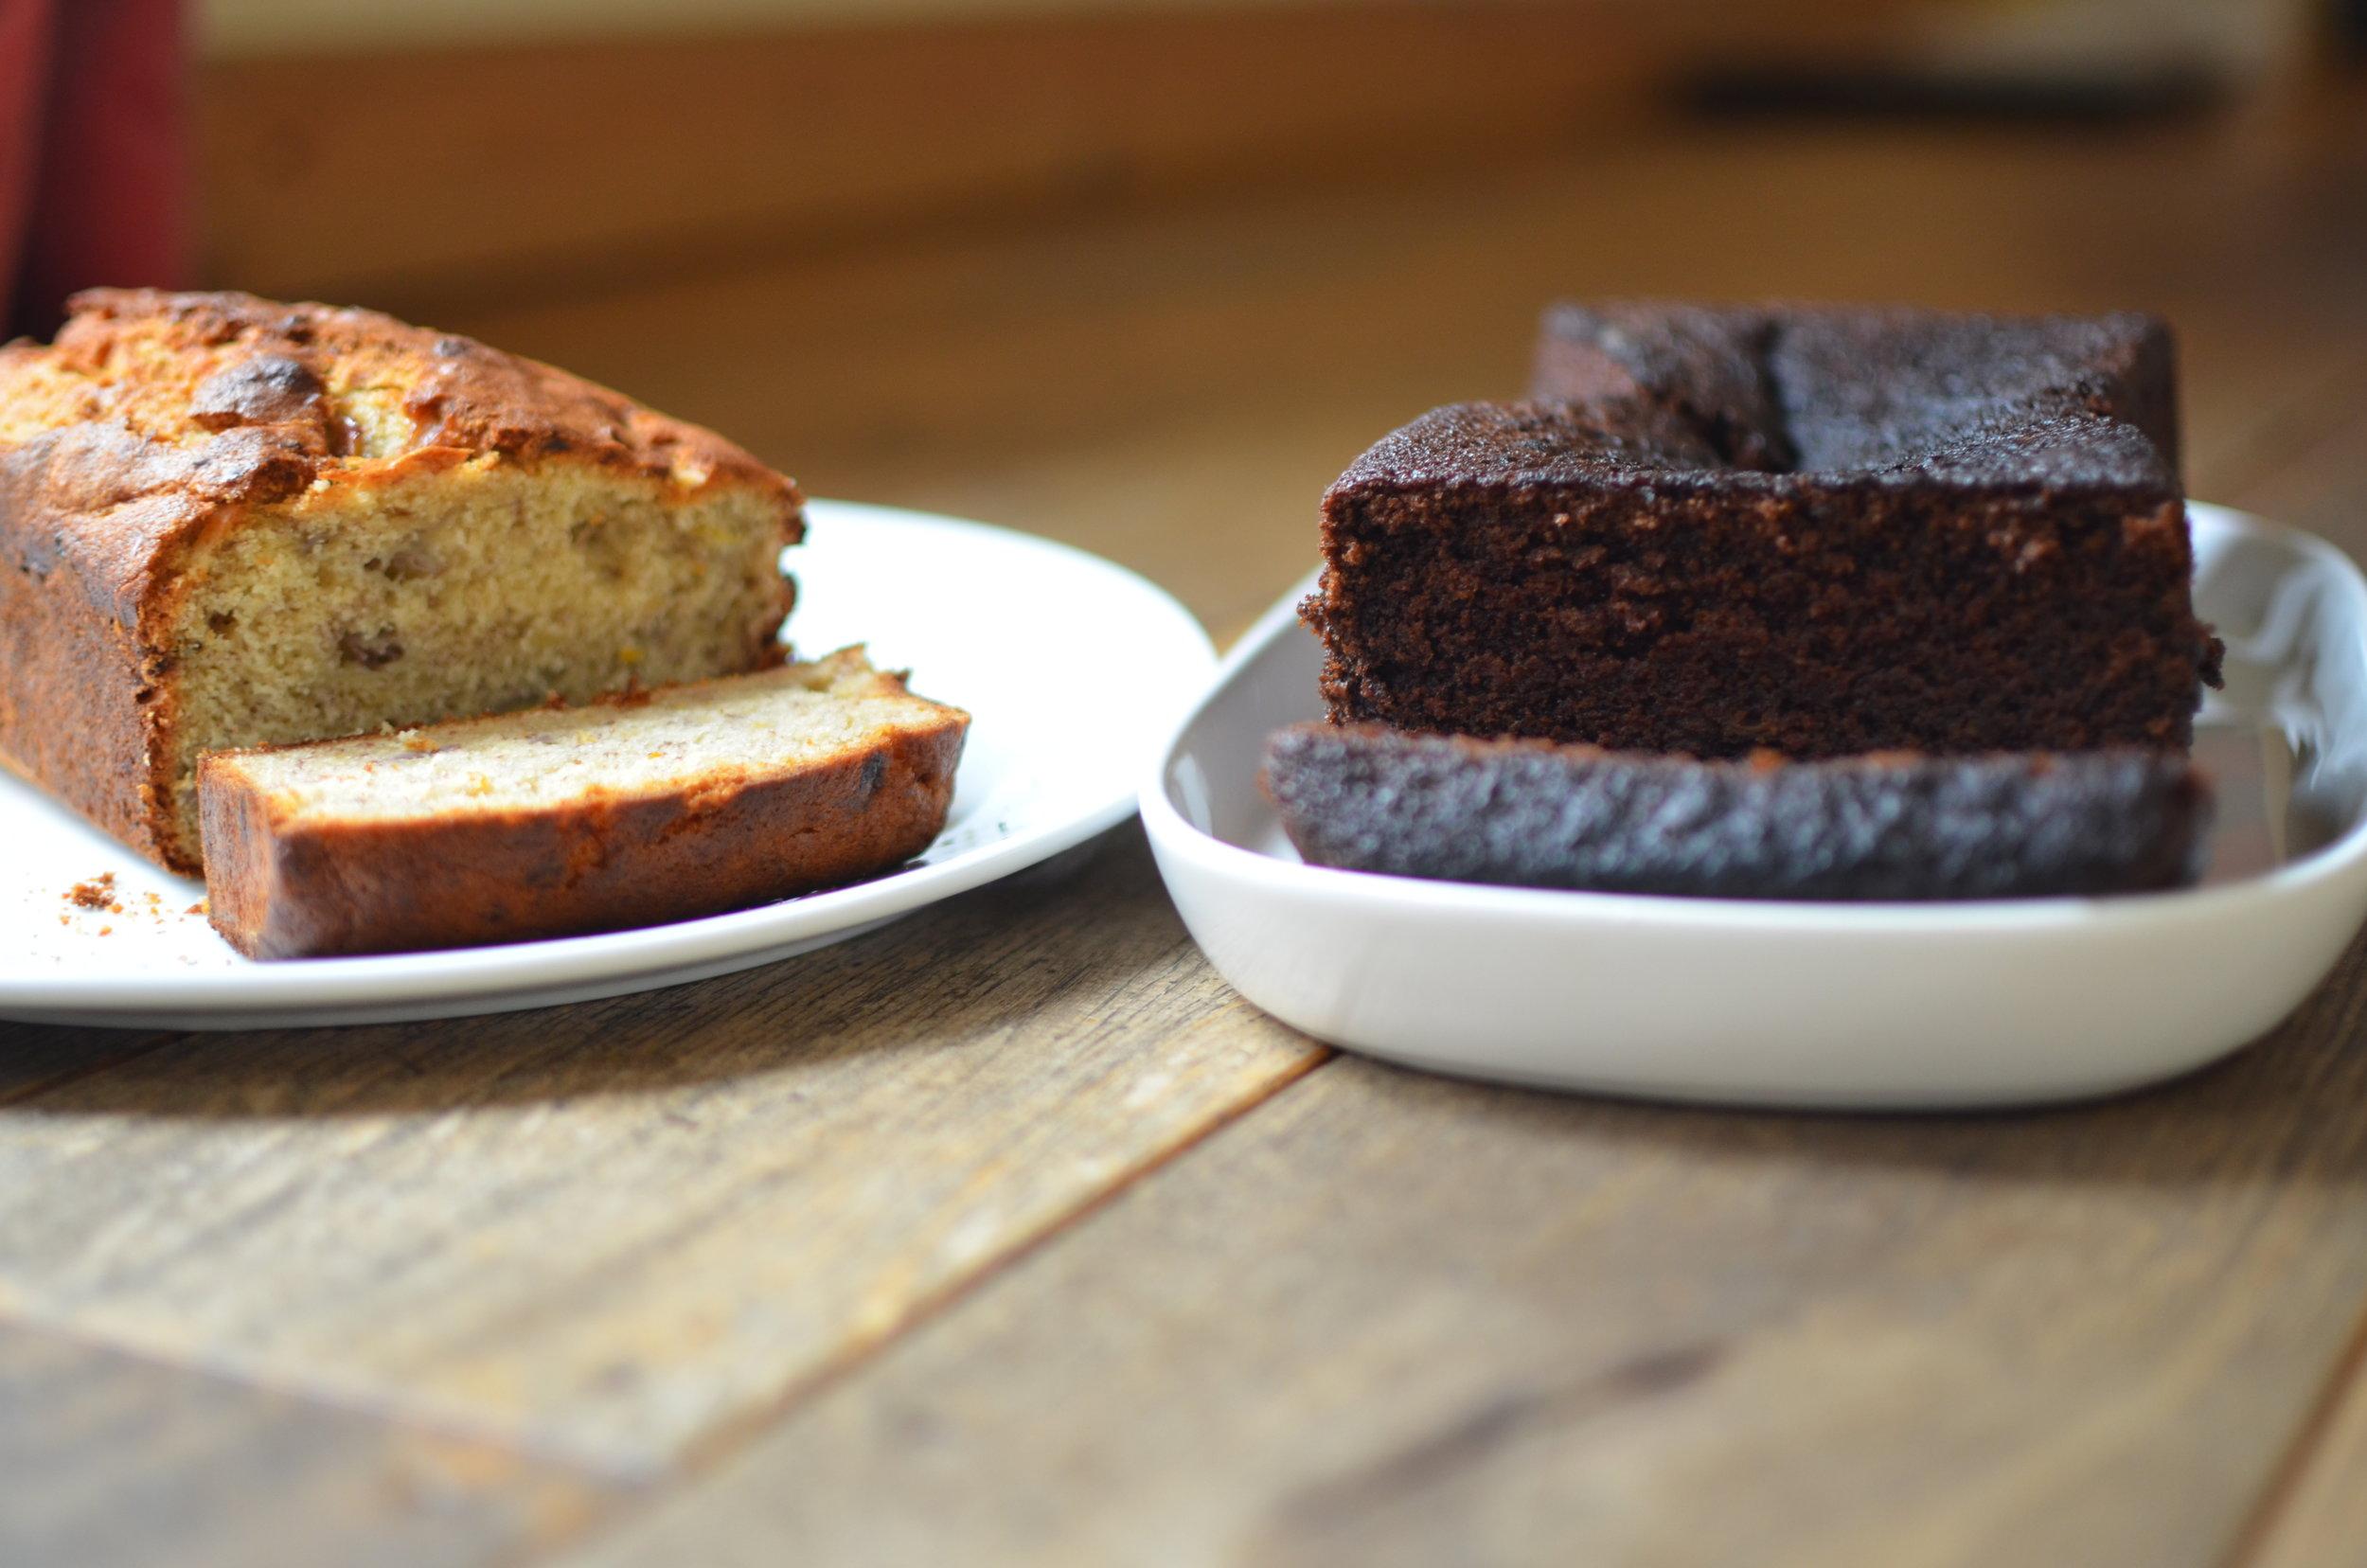 Delia Smith's Banana and Walnut Loaf and Nigella Lawson's Dense Chocolate Loaf Cake